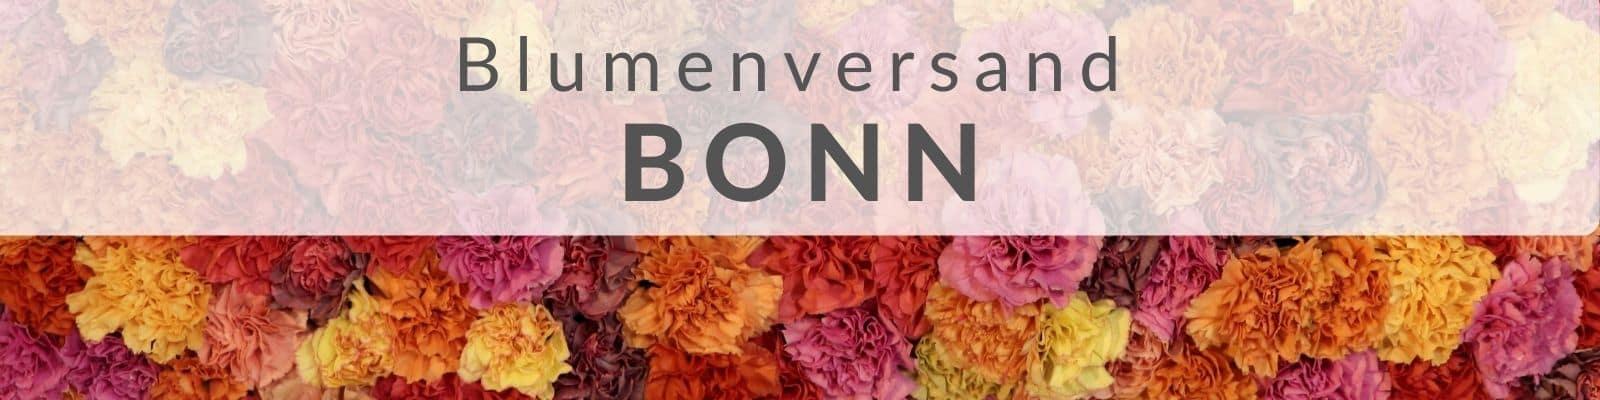 Blumenversand Bonn - Blumen verschicken